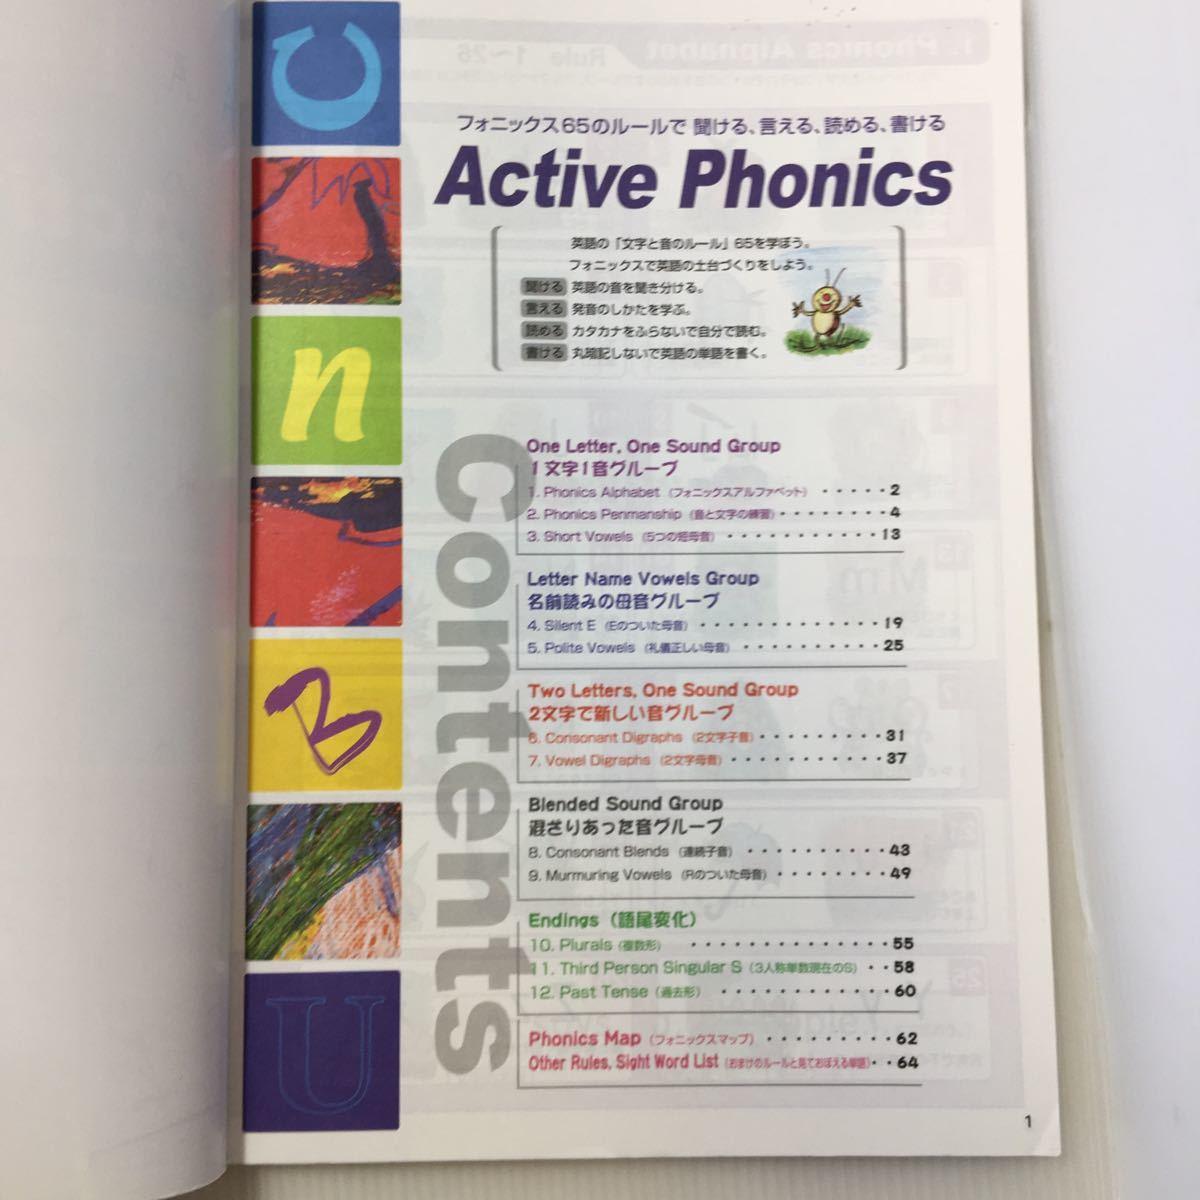 zaa-048★ Active Phonics テキスト ペーパーバック 2011/1/1 松香 洋子 (著), 宮 清子 (著), 松香洋子(まつか ようこ) (編集)